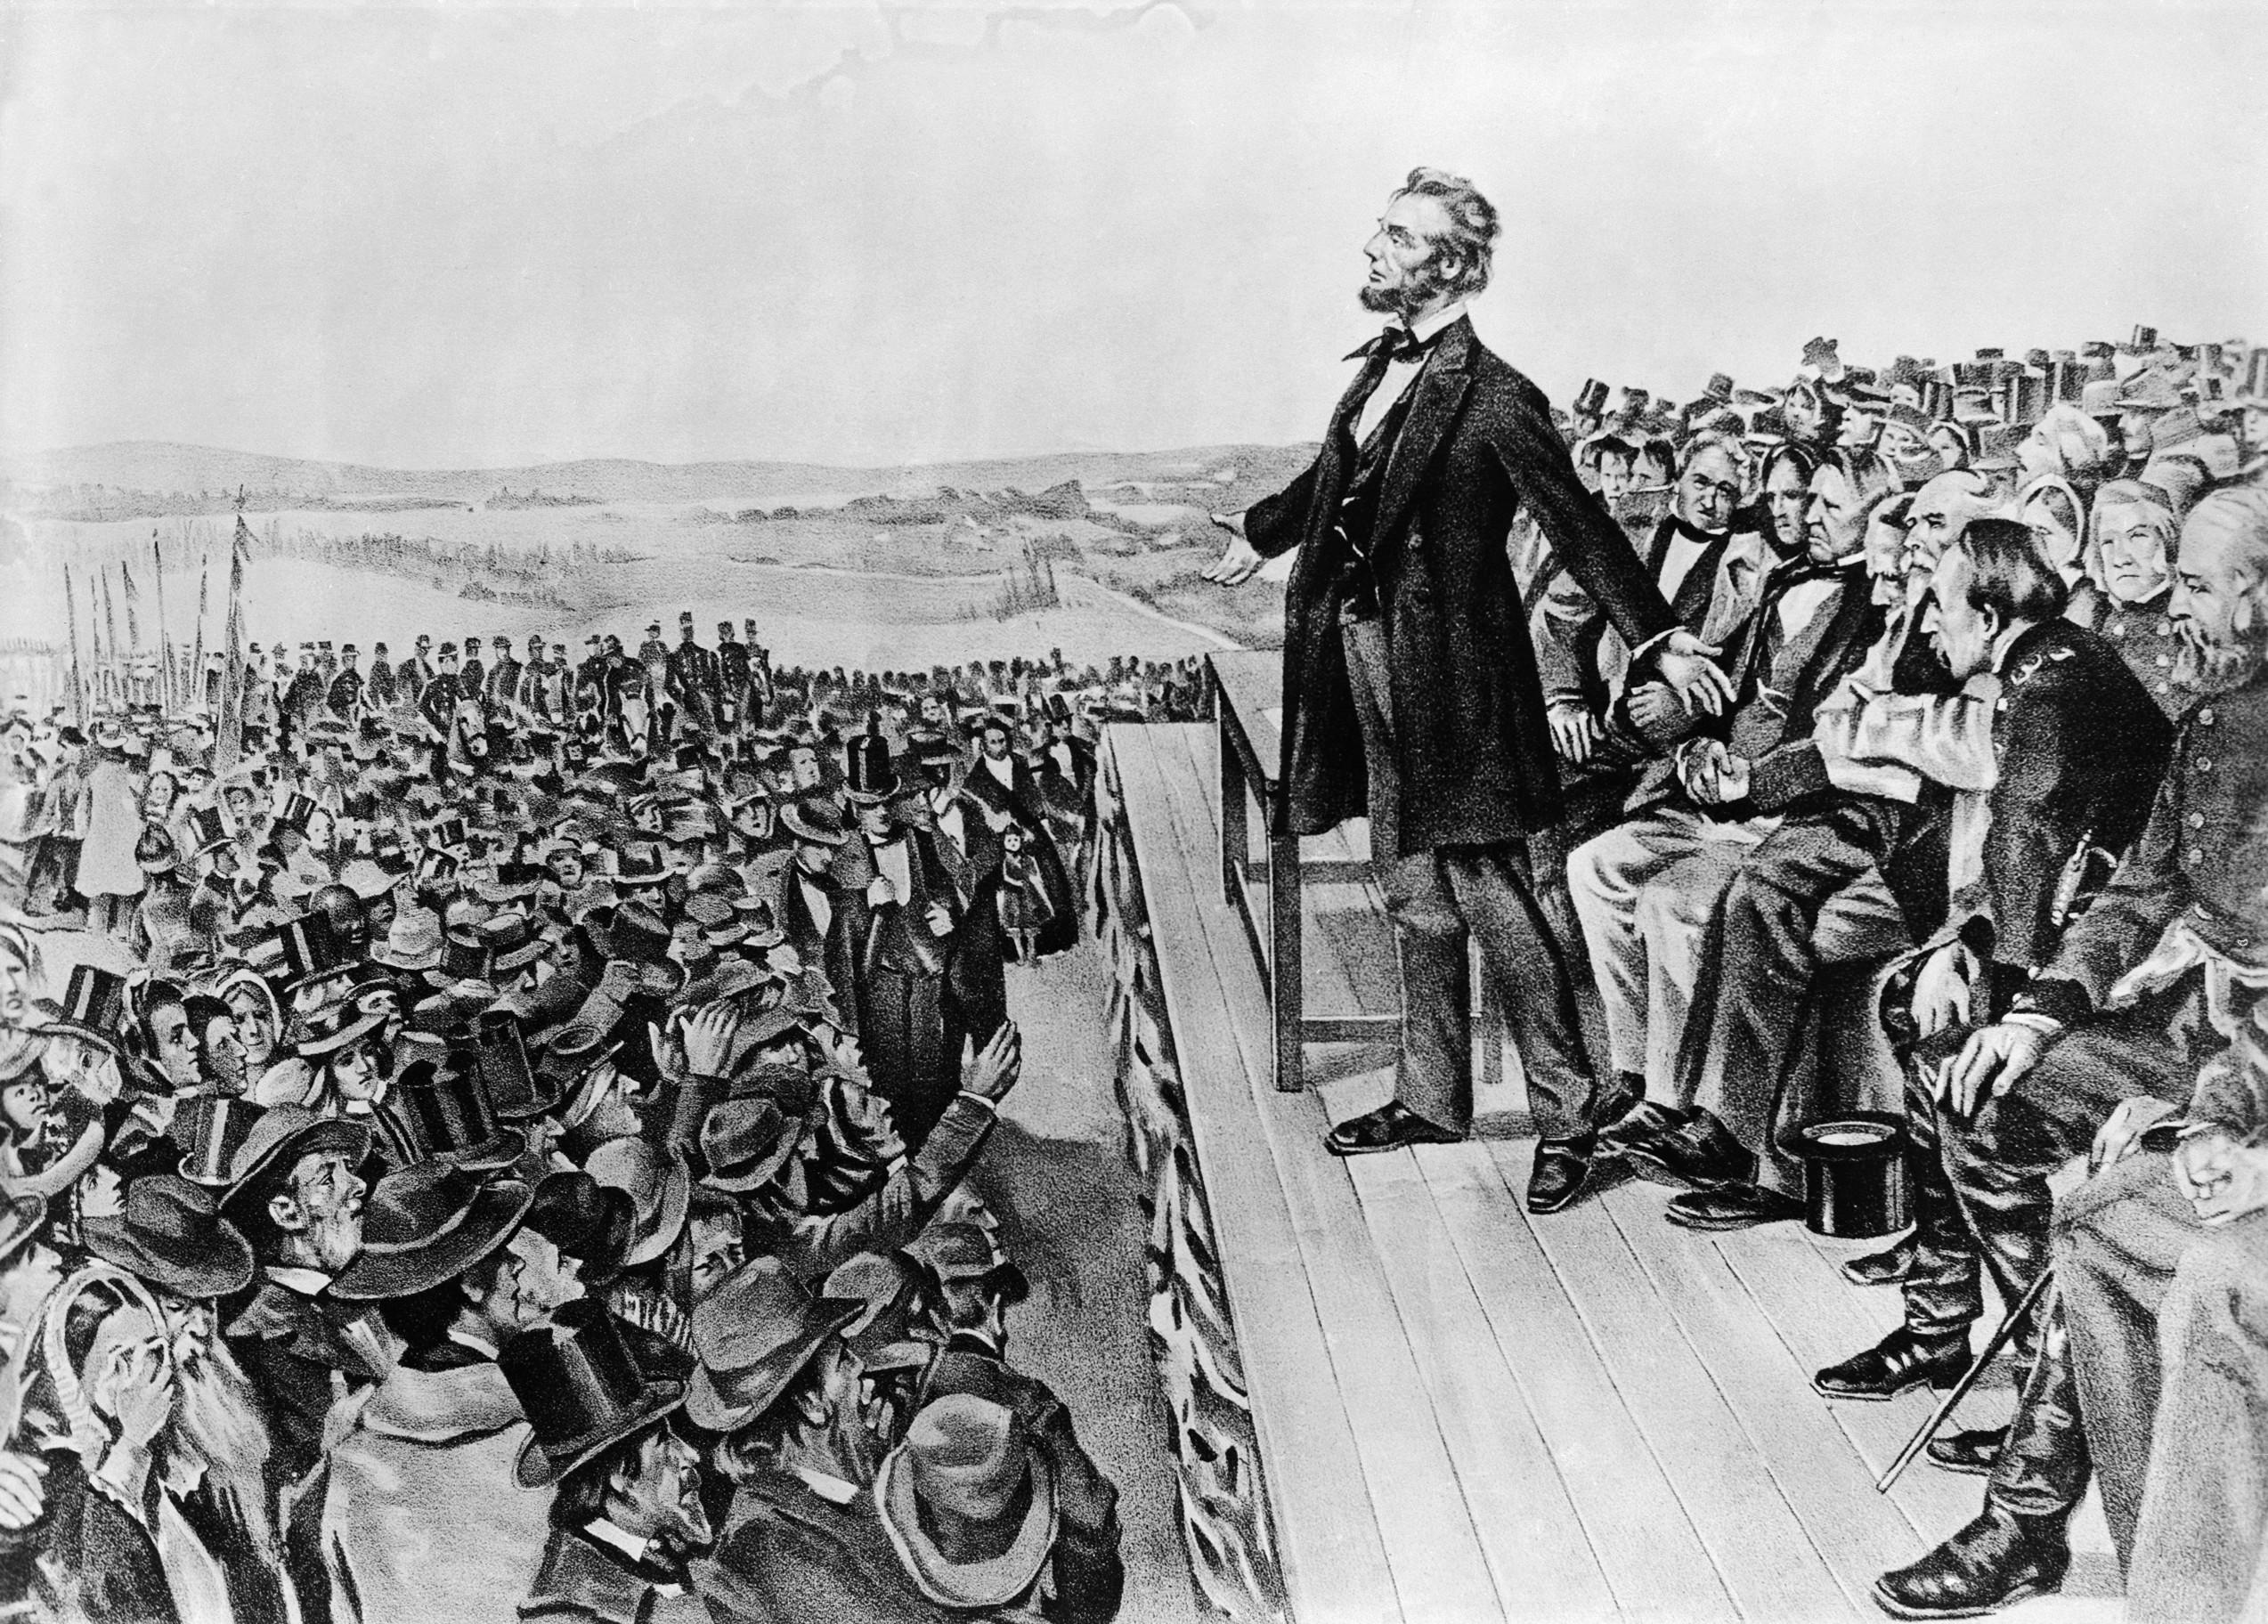 Mencken and More on Lincoln's Speech | B'Man's Revolt